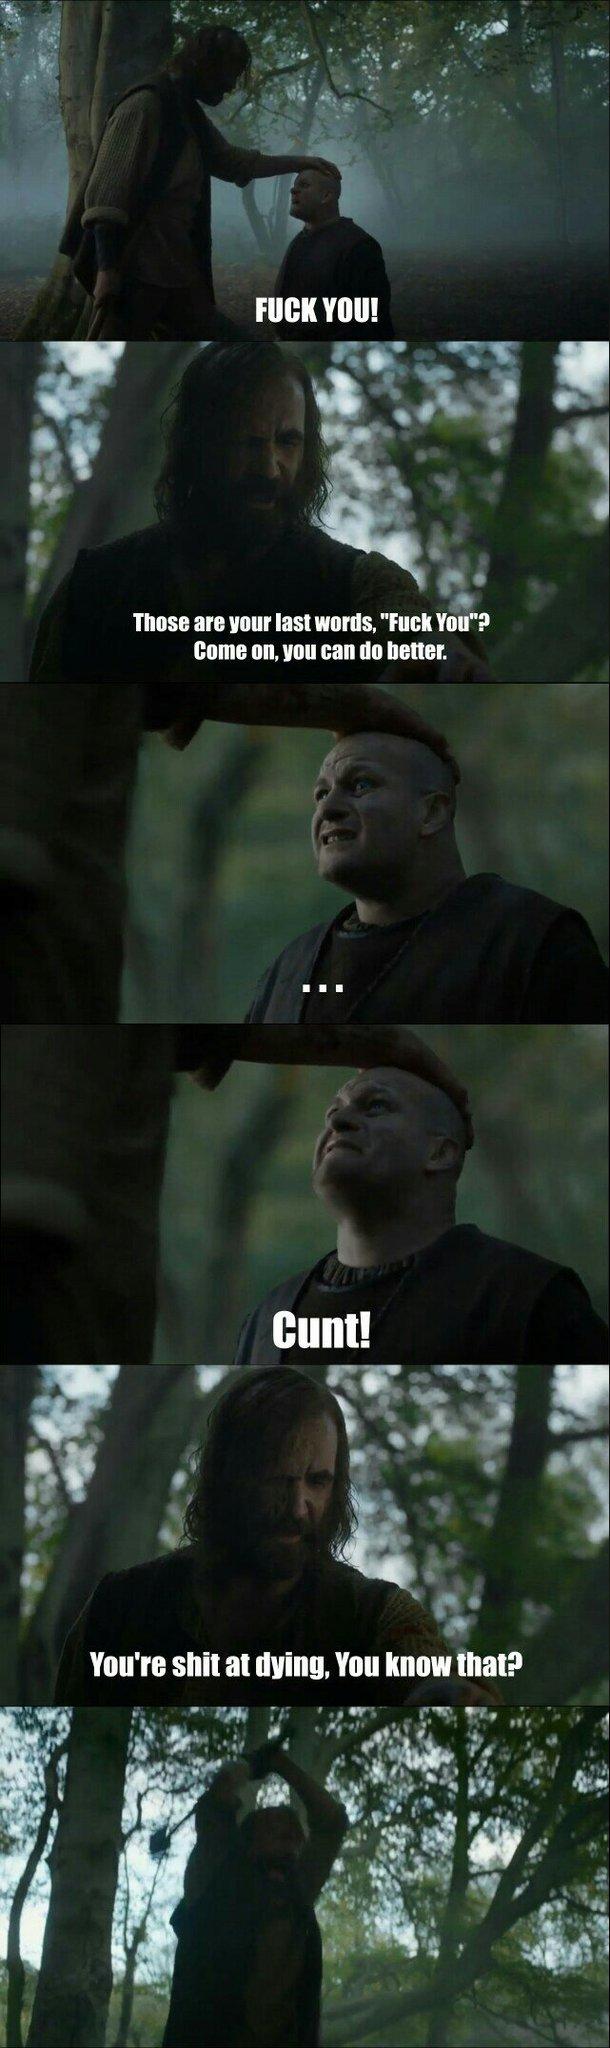 The Hound <3 - meme